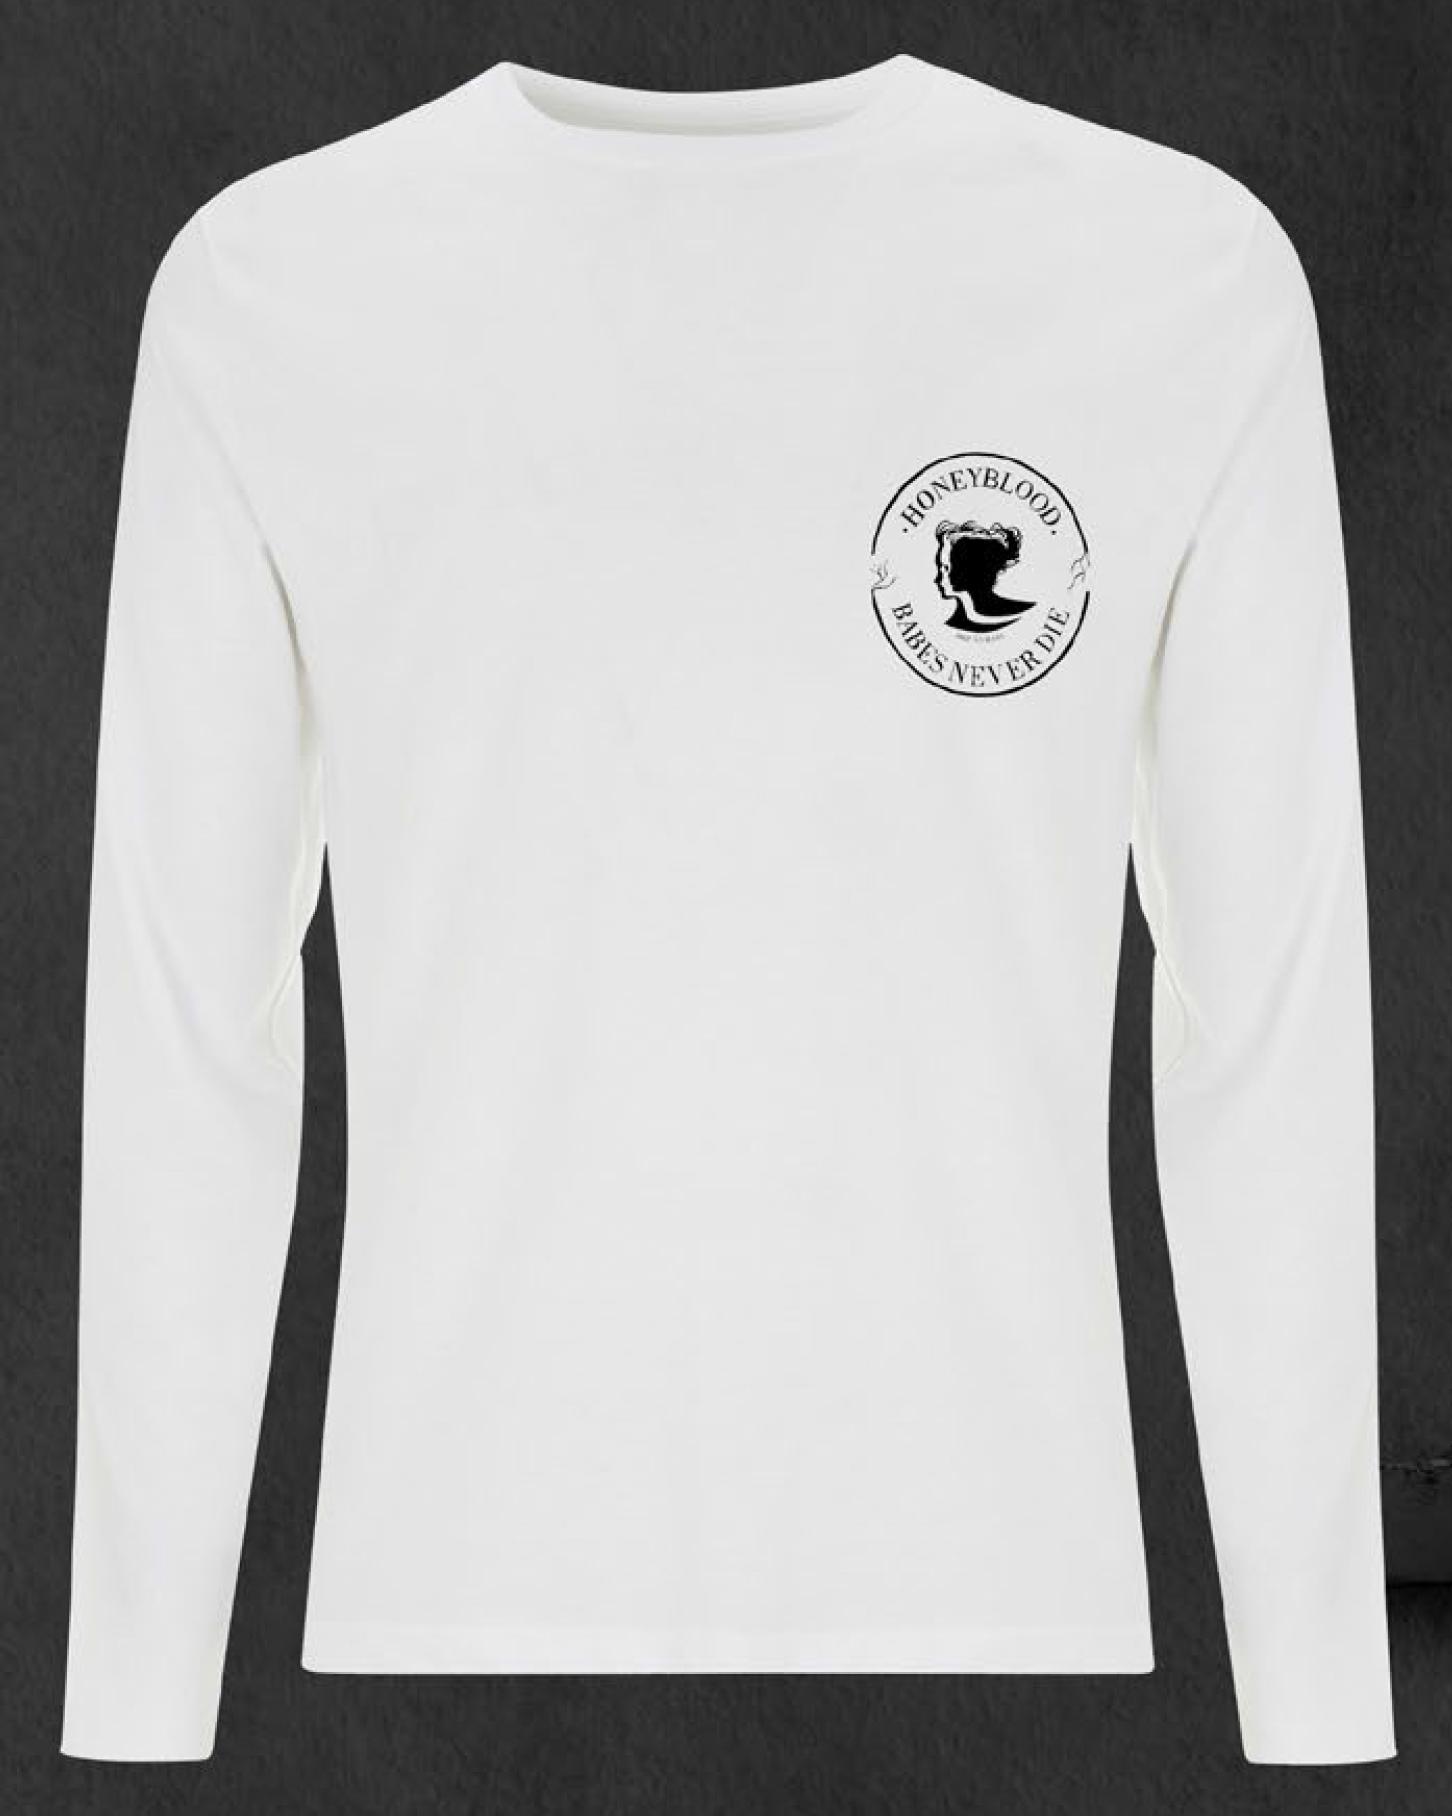 'Babes Never Die' Longsleeve T-shirt (White)